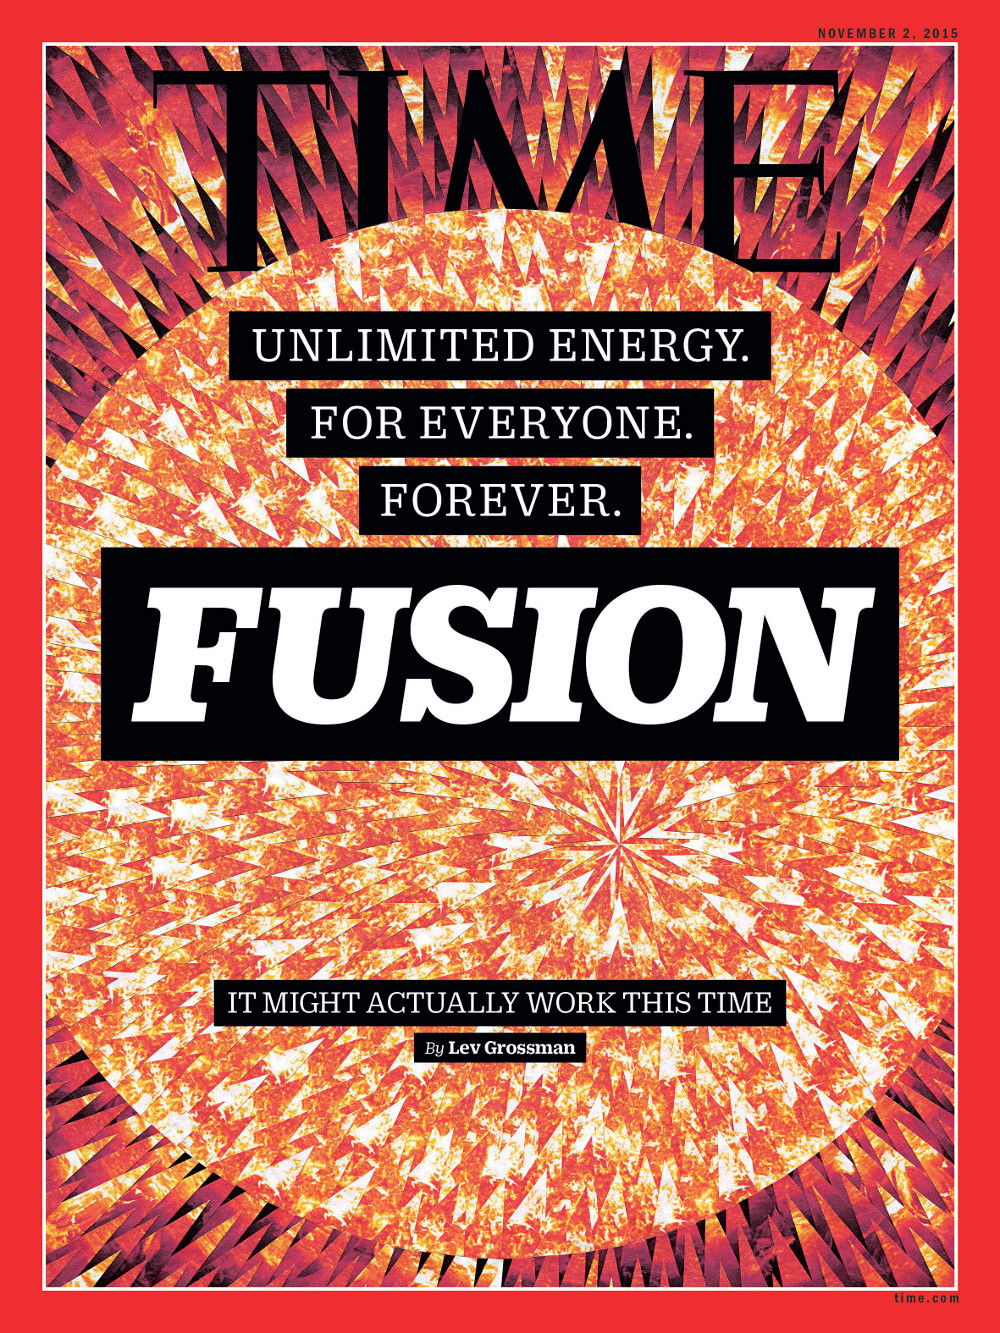 time Cover Art Sun fusion